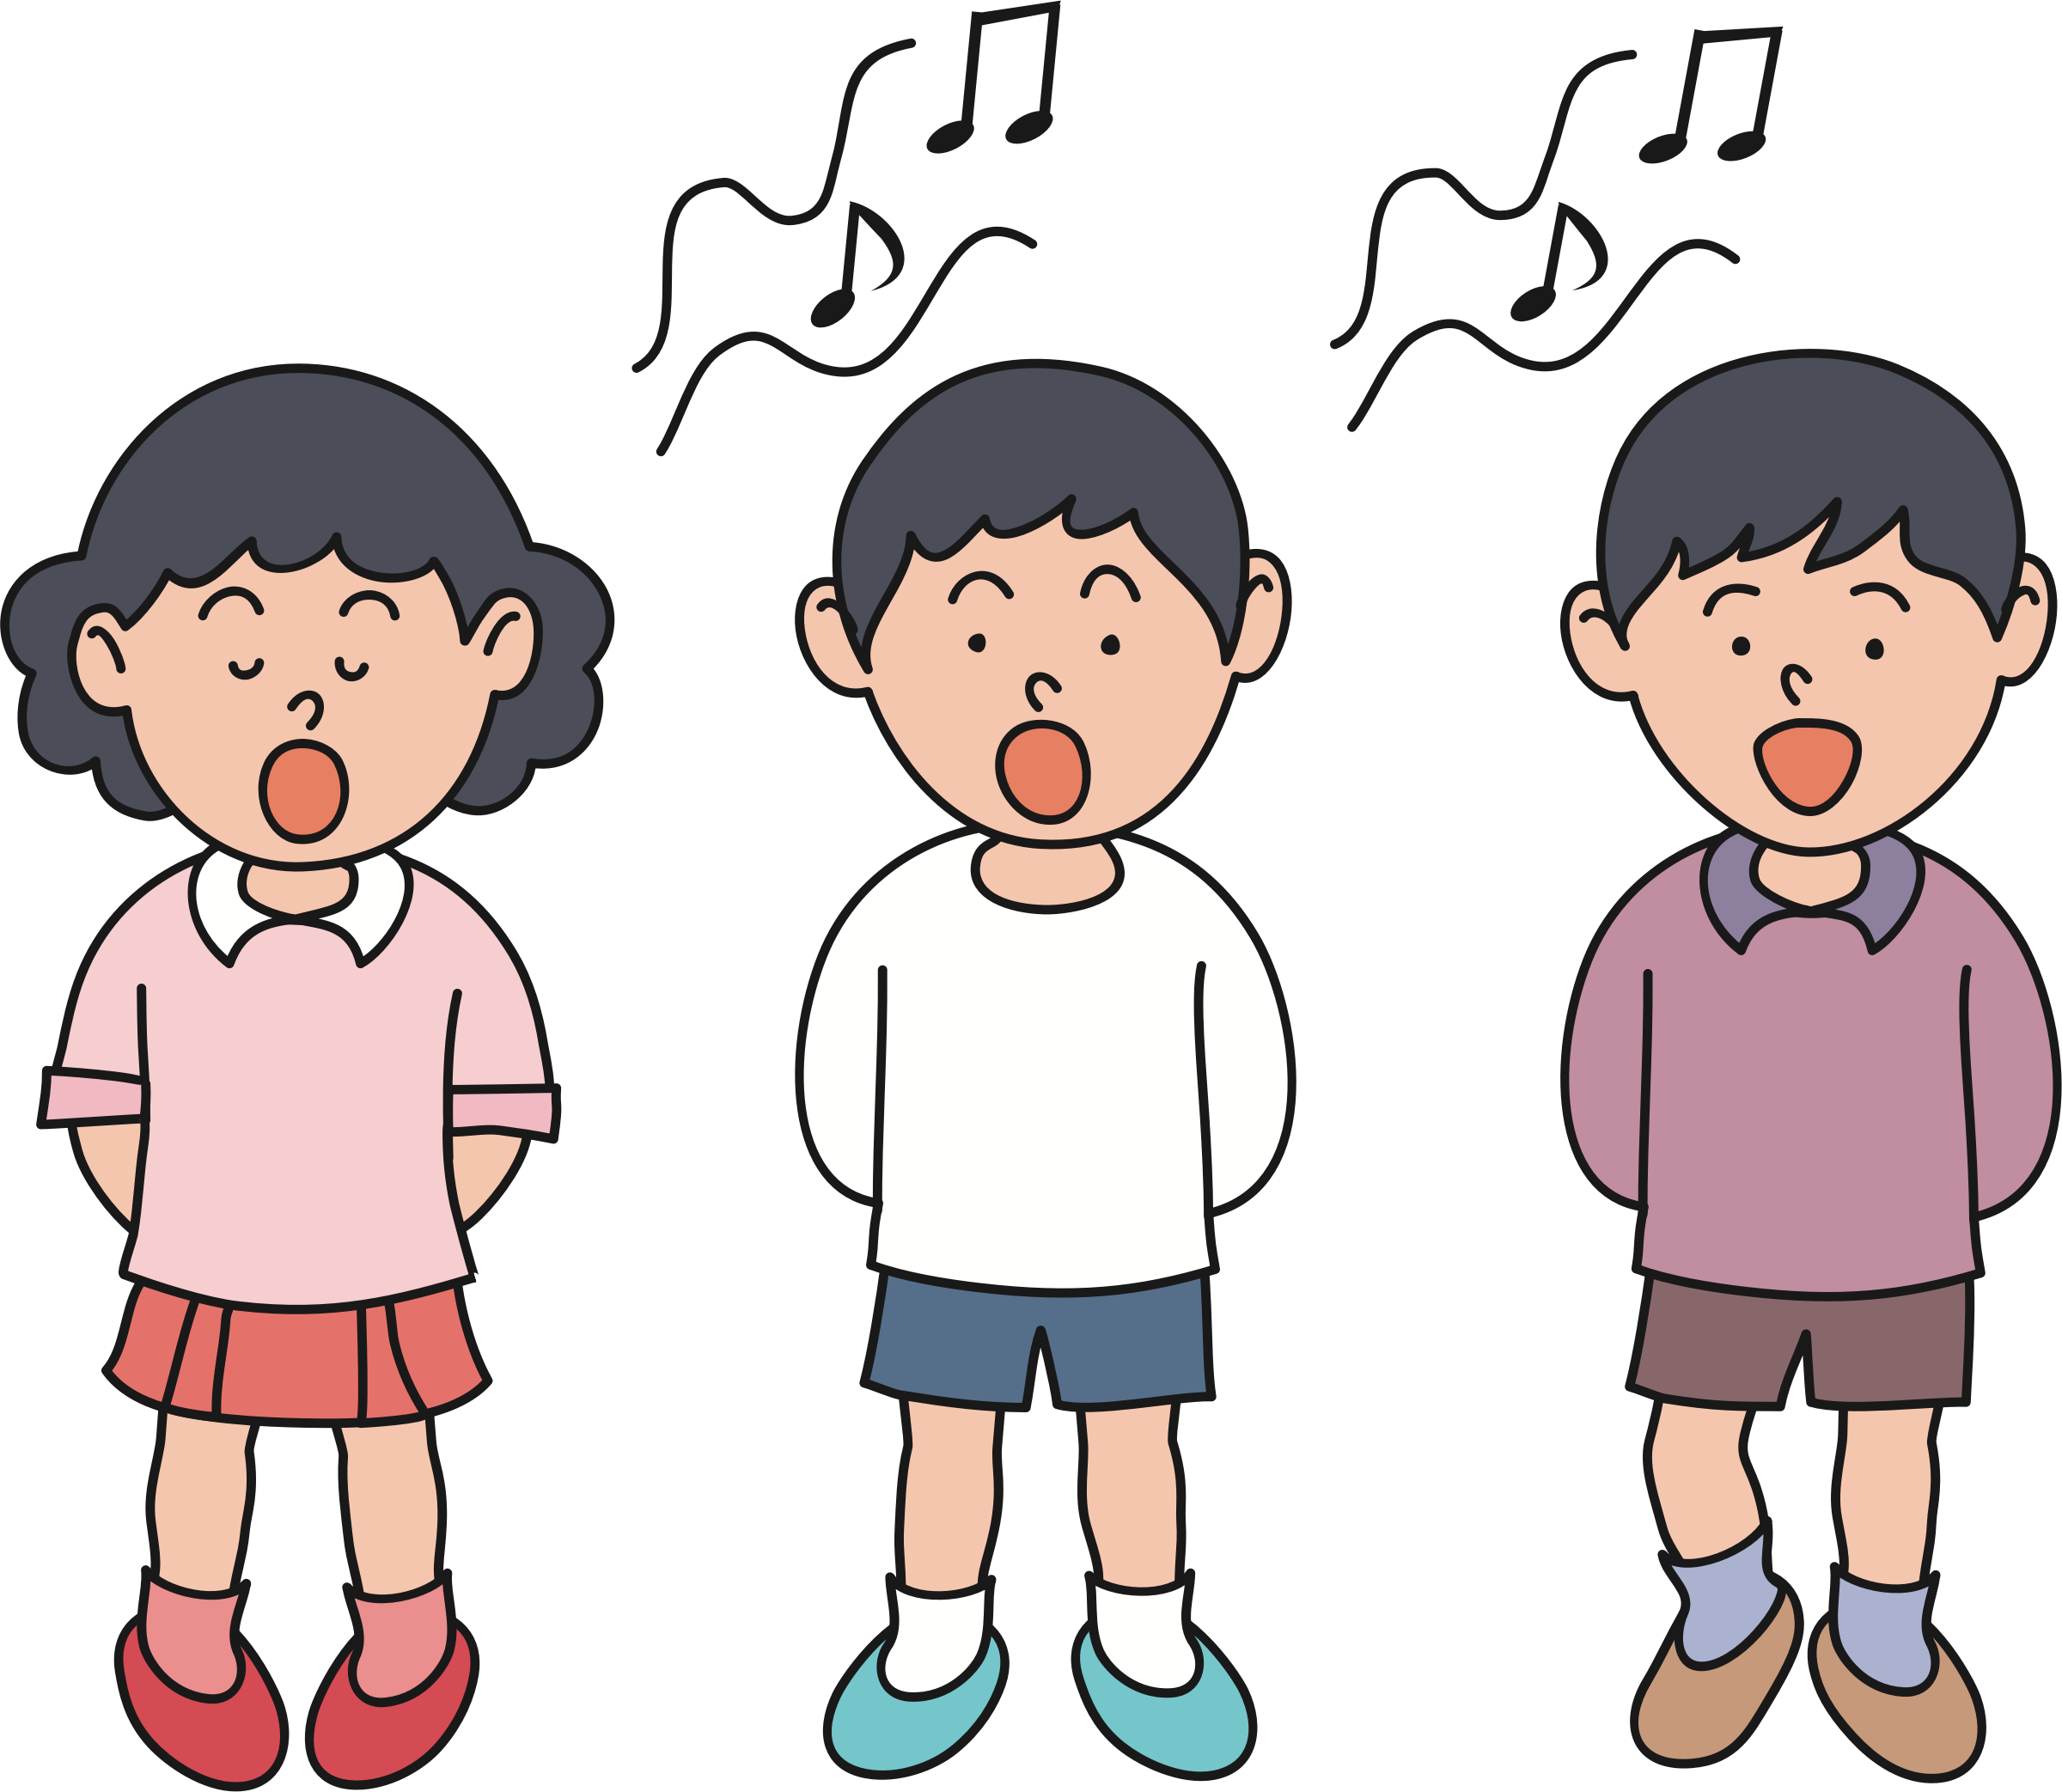 Children singing big image. Musician clipart boy singer